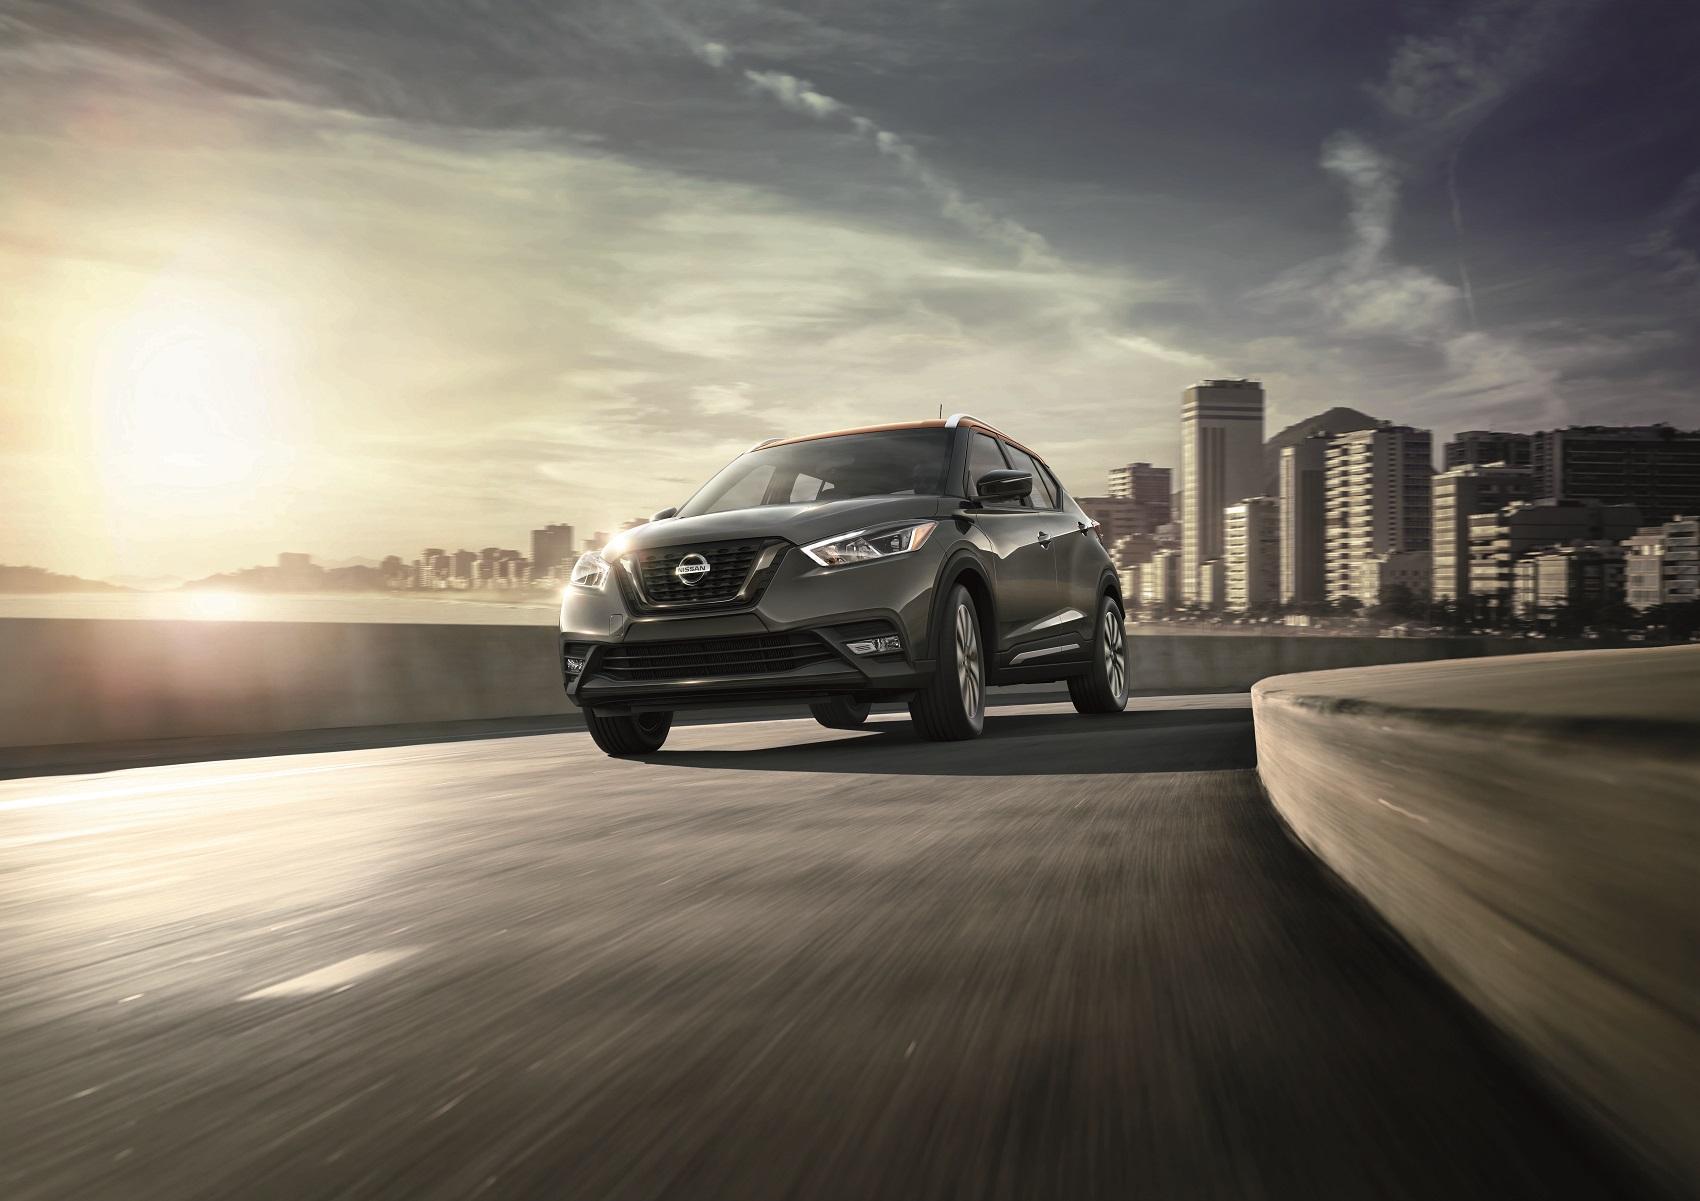 Waycross, GA | Nissan Kicks